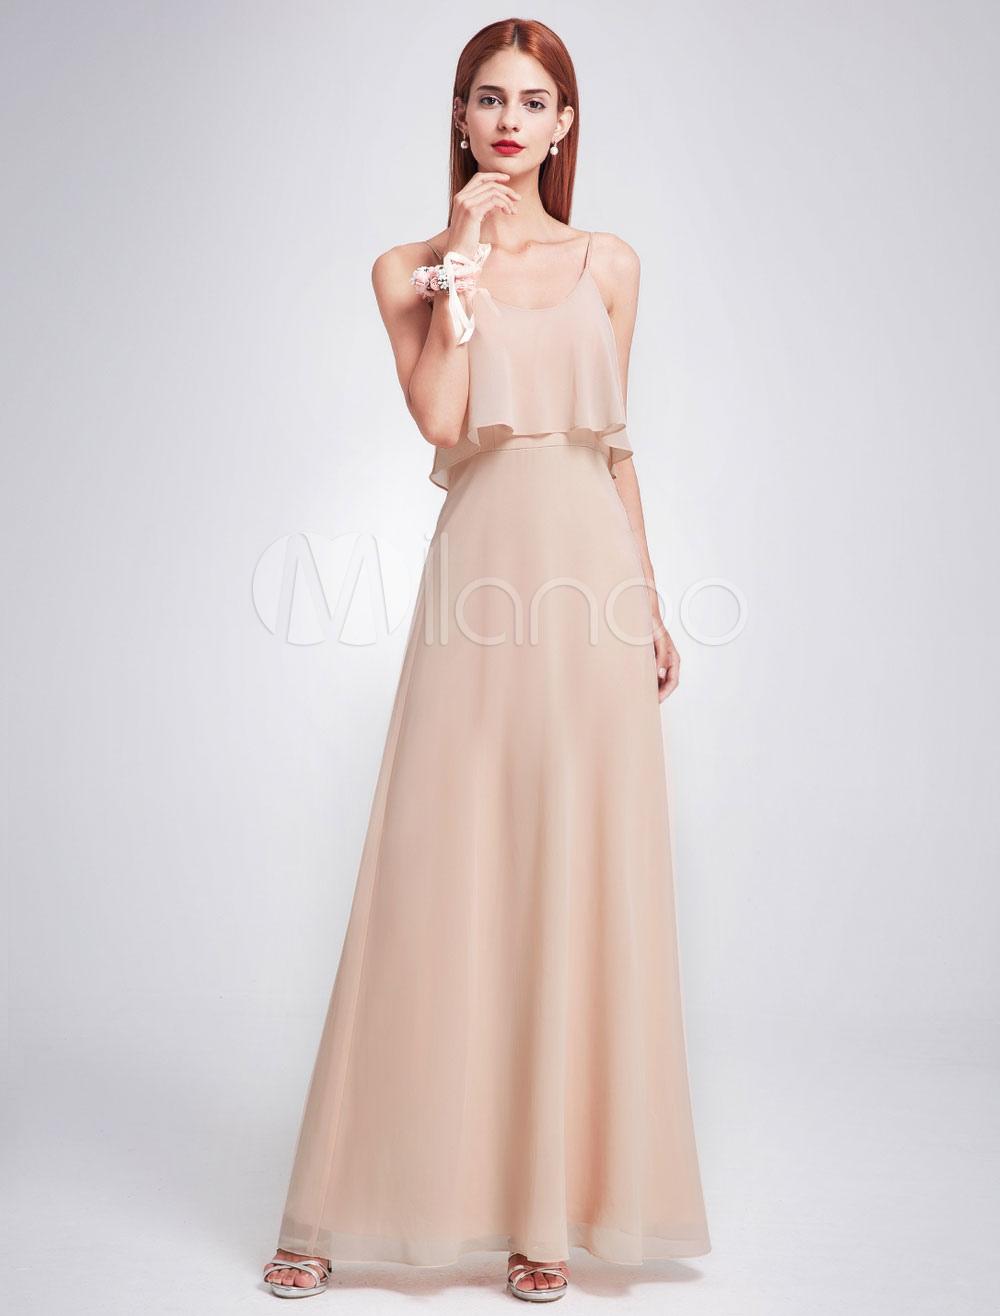 Champagne Bridesmaid Dress Long Chiffon Straps Sleeveless Ruffles Party Dresses A Line Floor Length Prom Dresses (Wedding) photo